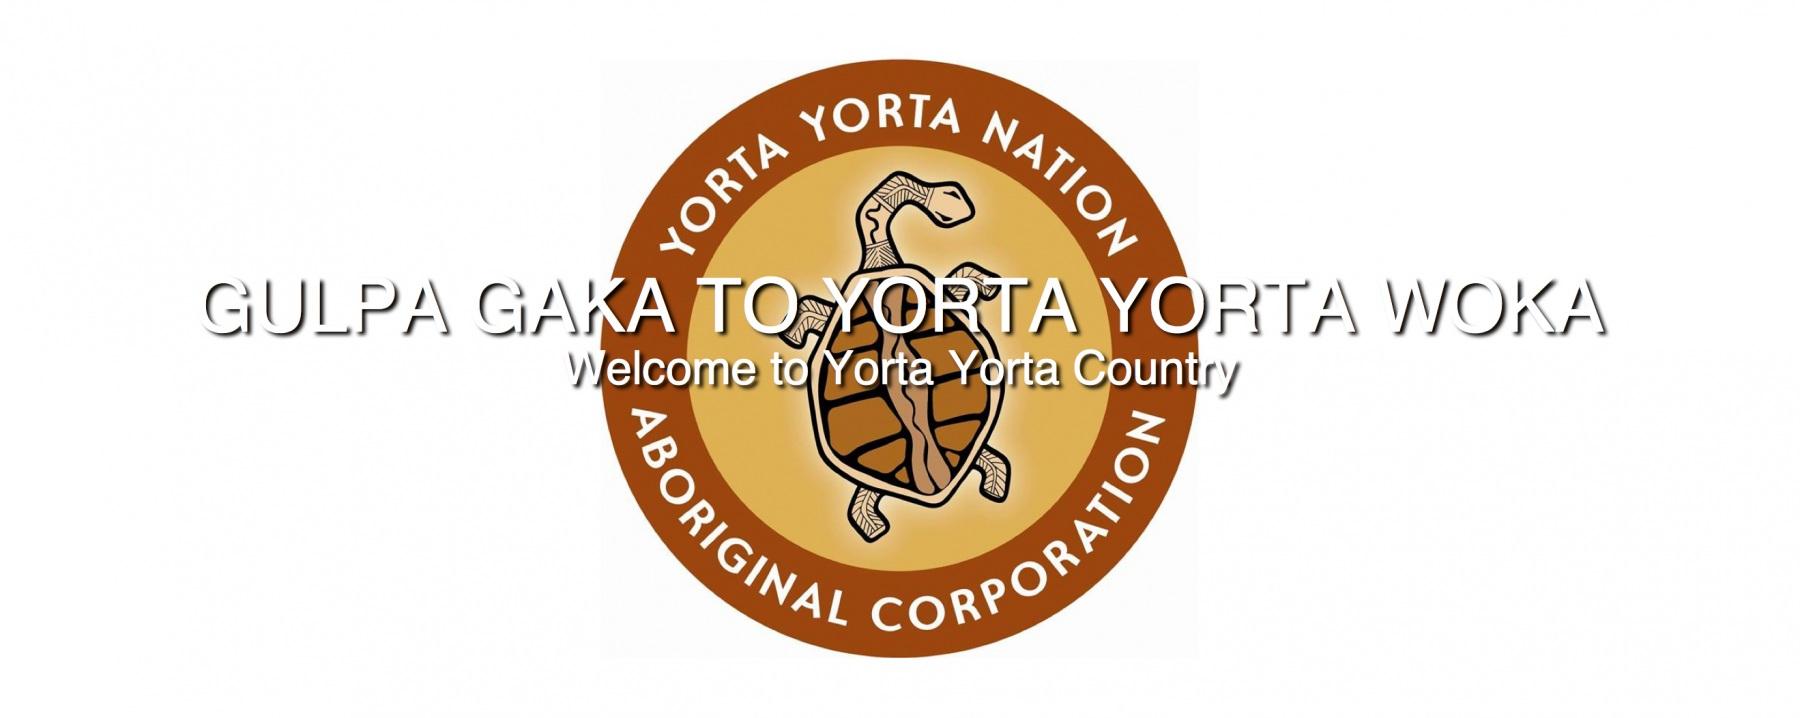 YYNAC-slider-001-logo-text